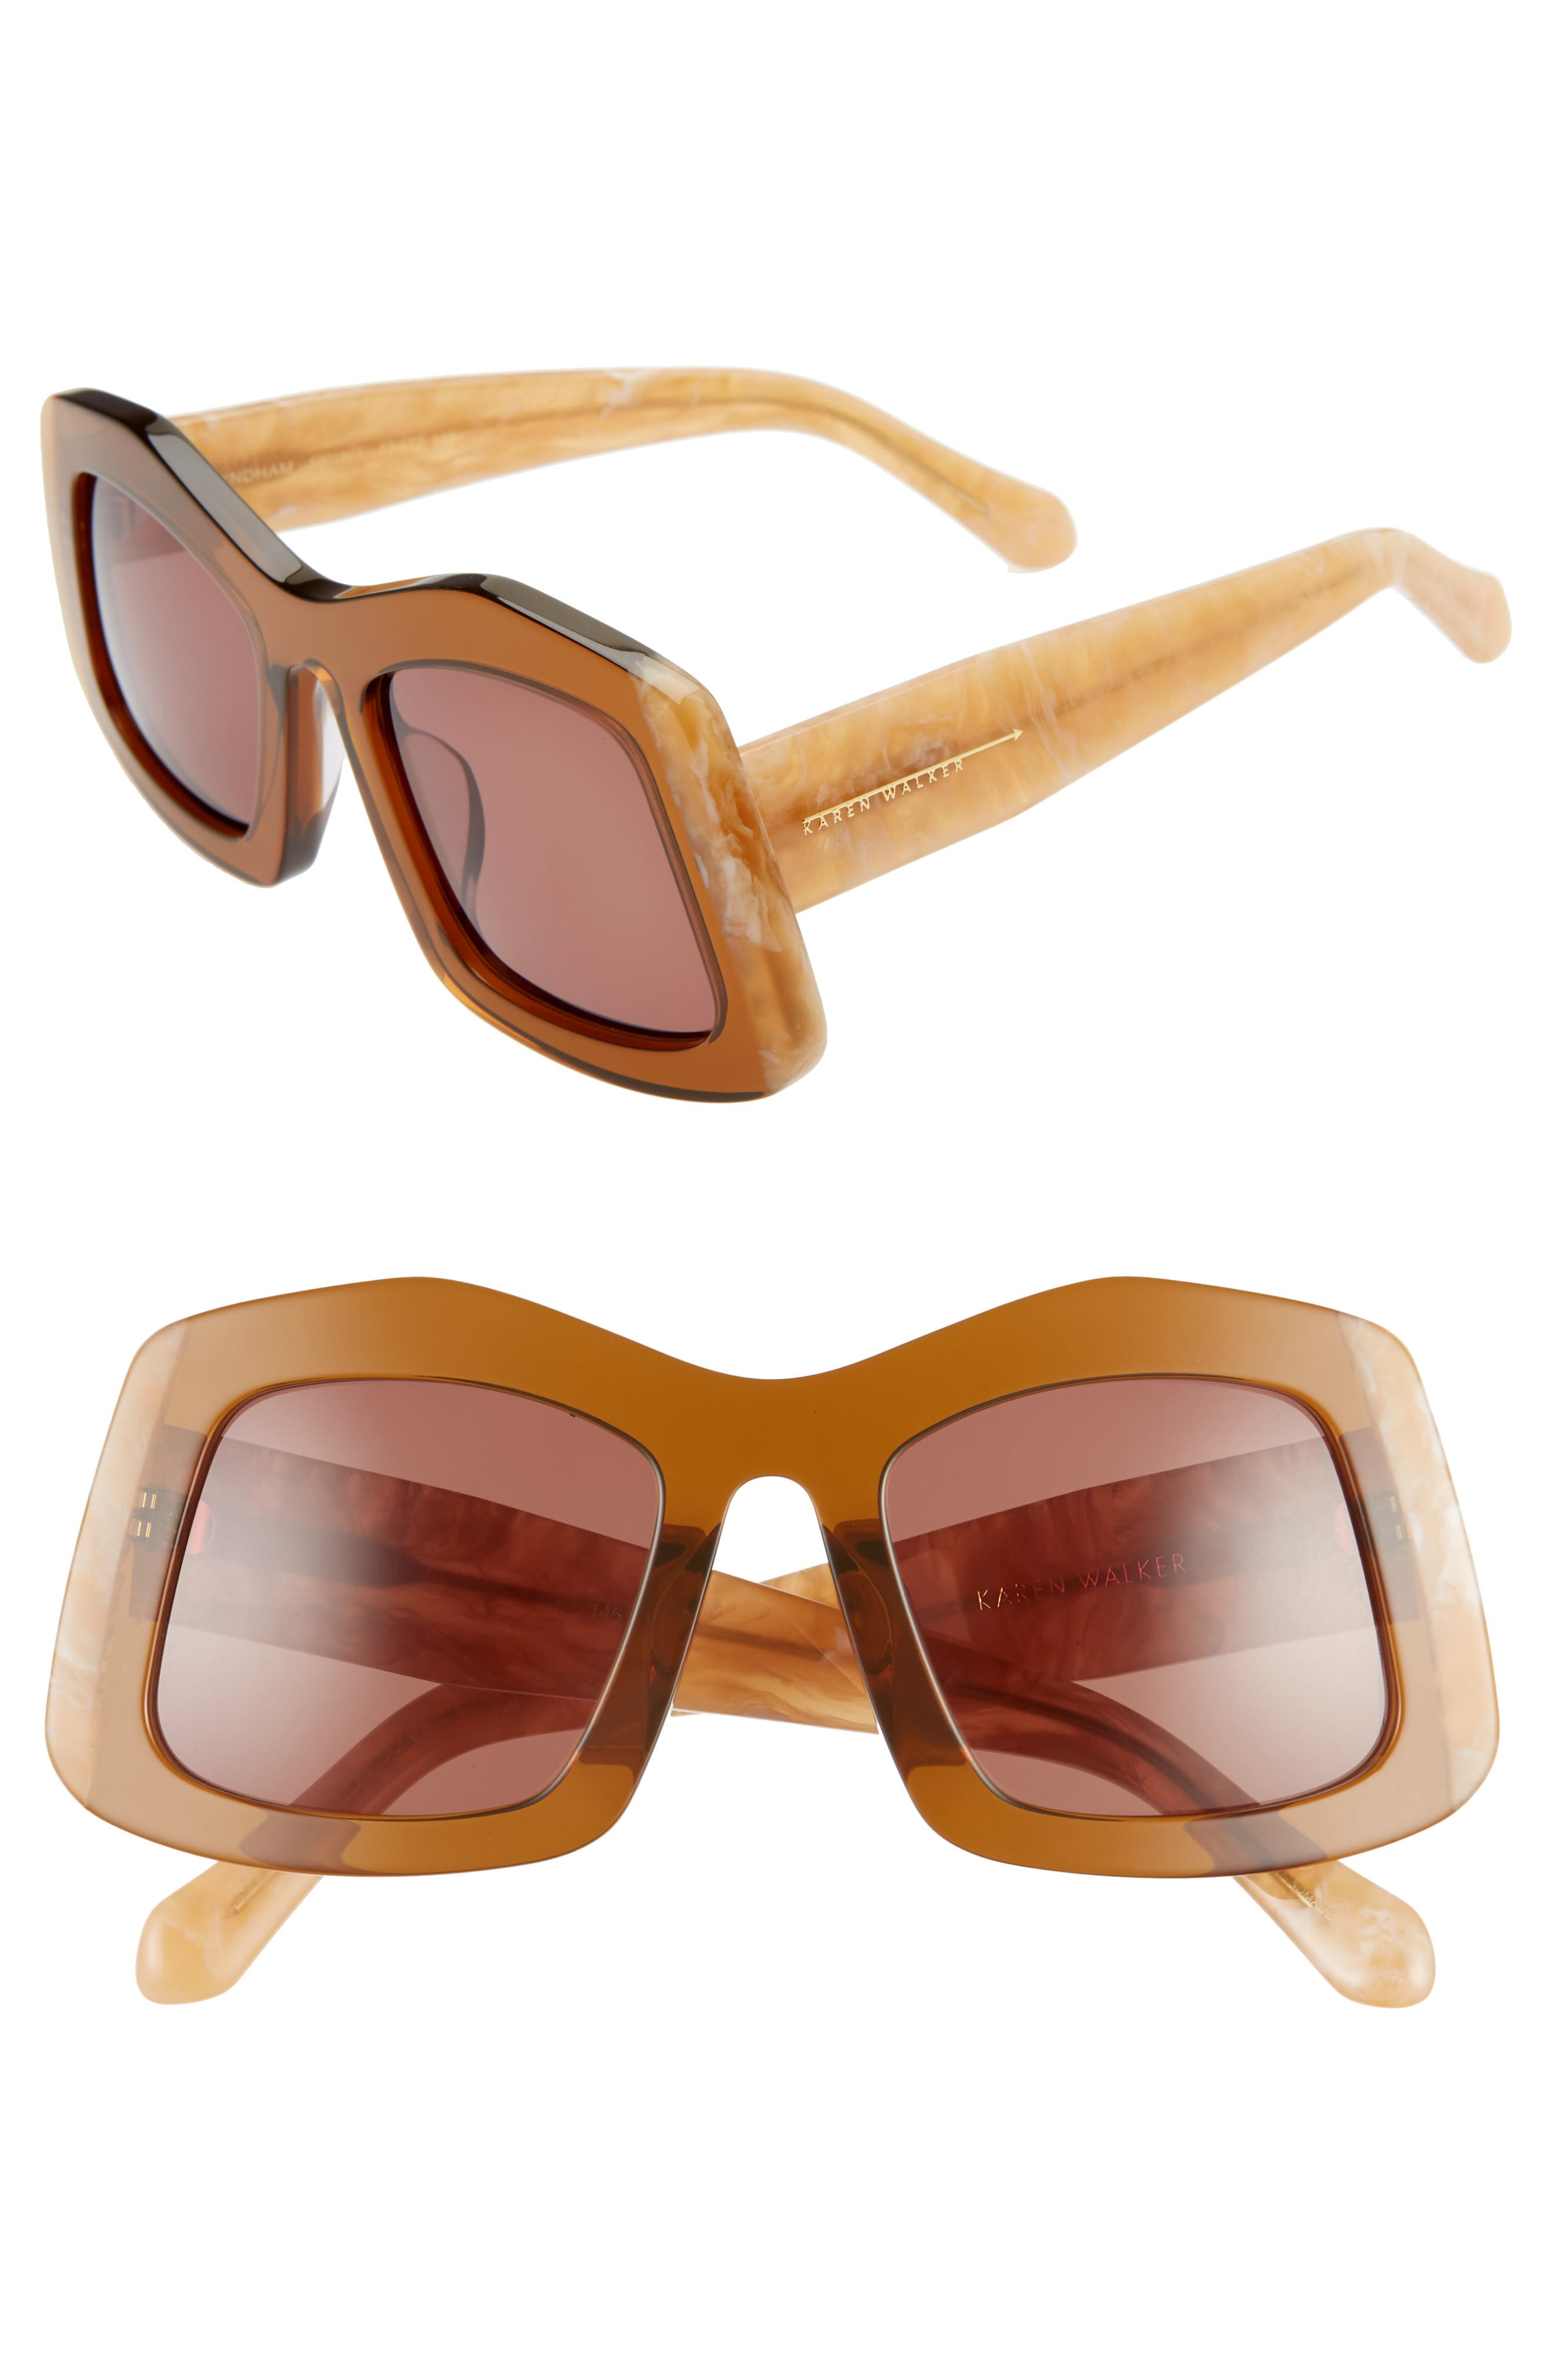 Wyndham 53mm Irregular Square Sunglasses